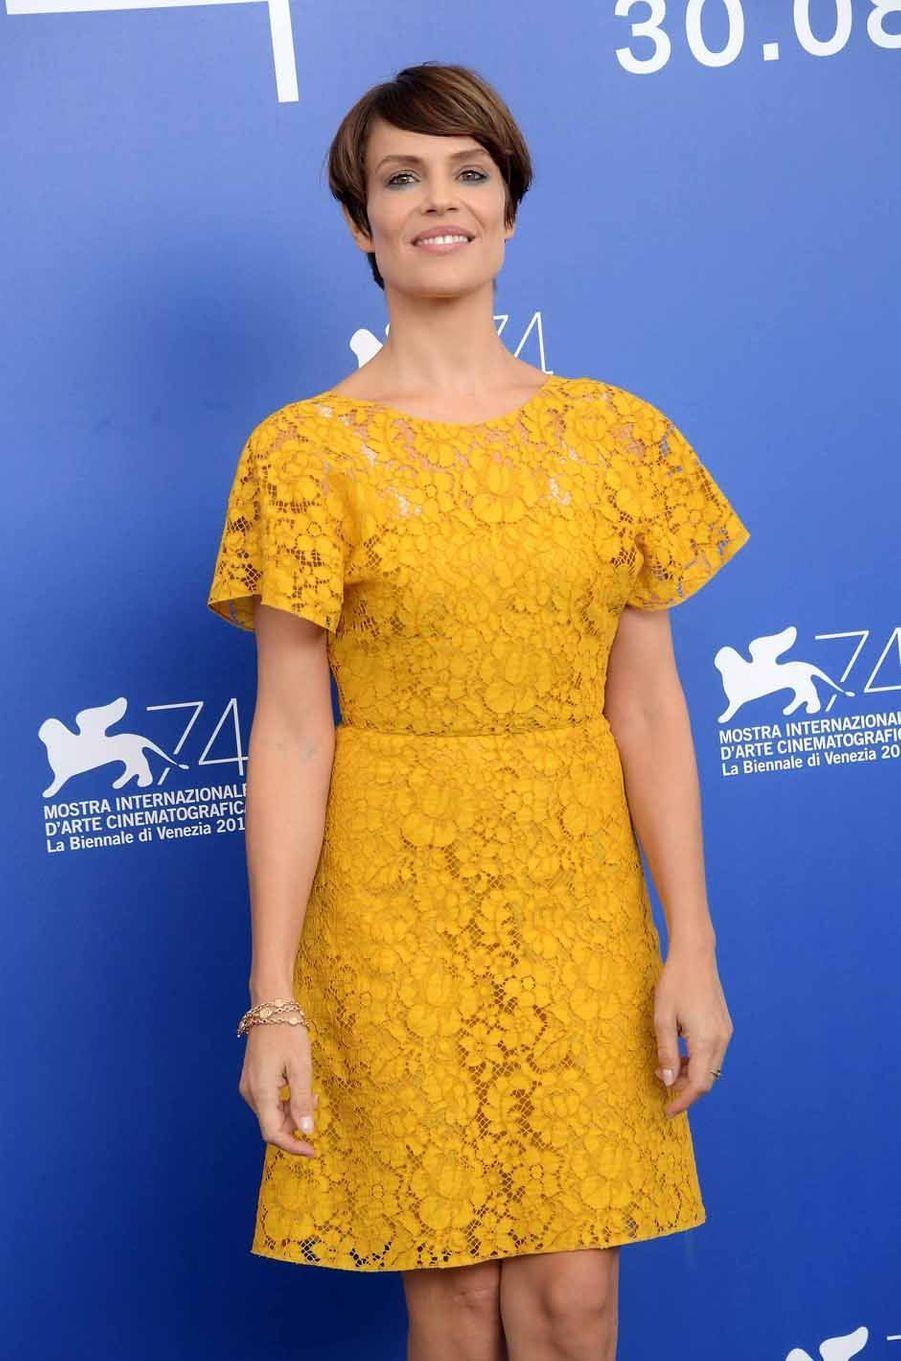 L'actrice italienne Micaela Ramazzotti